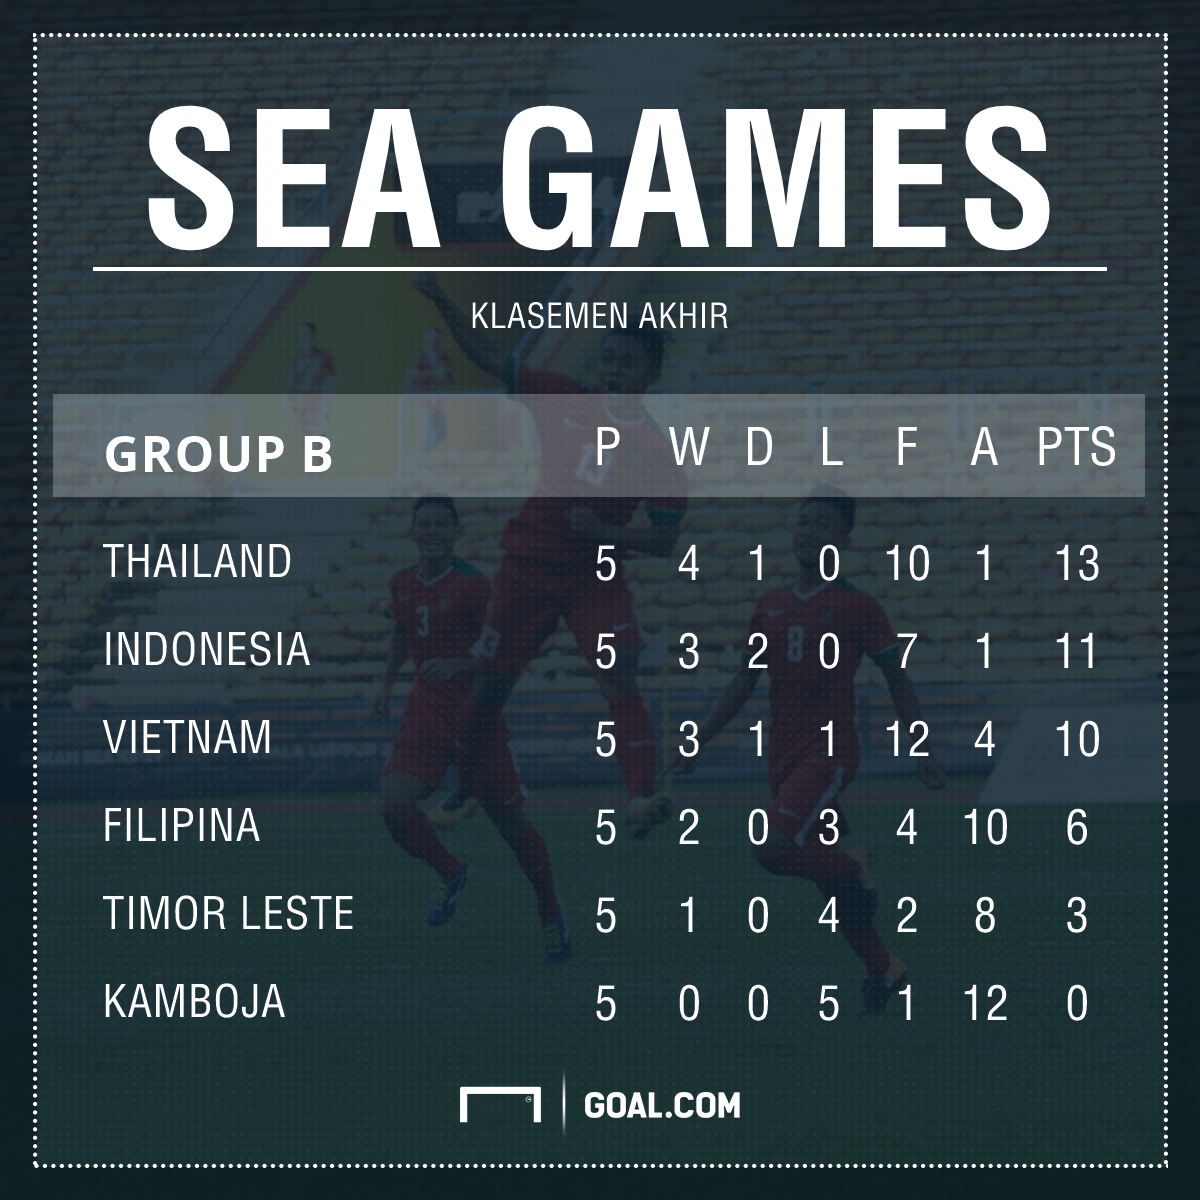 Klasemen Akhir Grup B SEA Games 2017